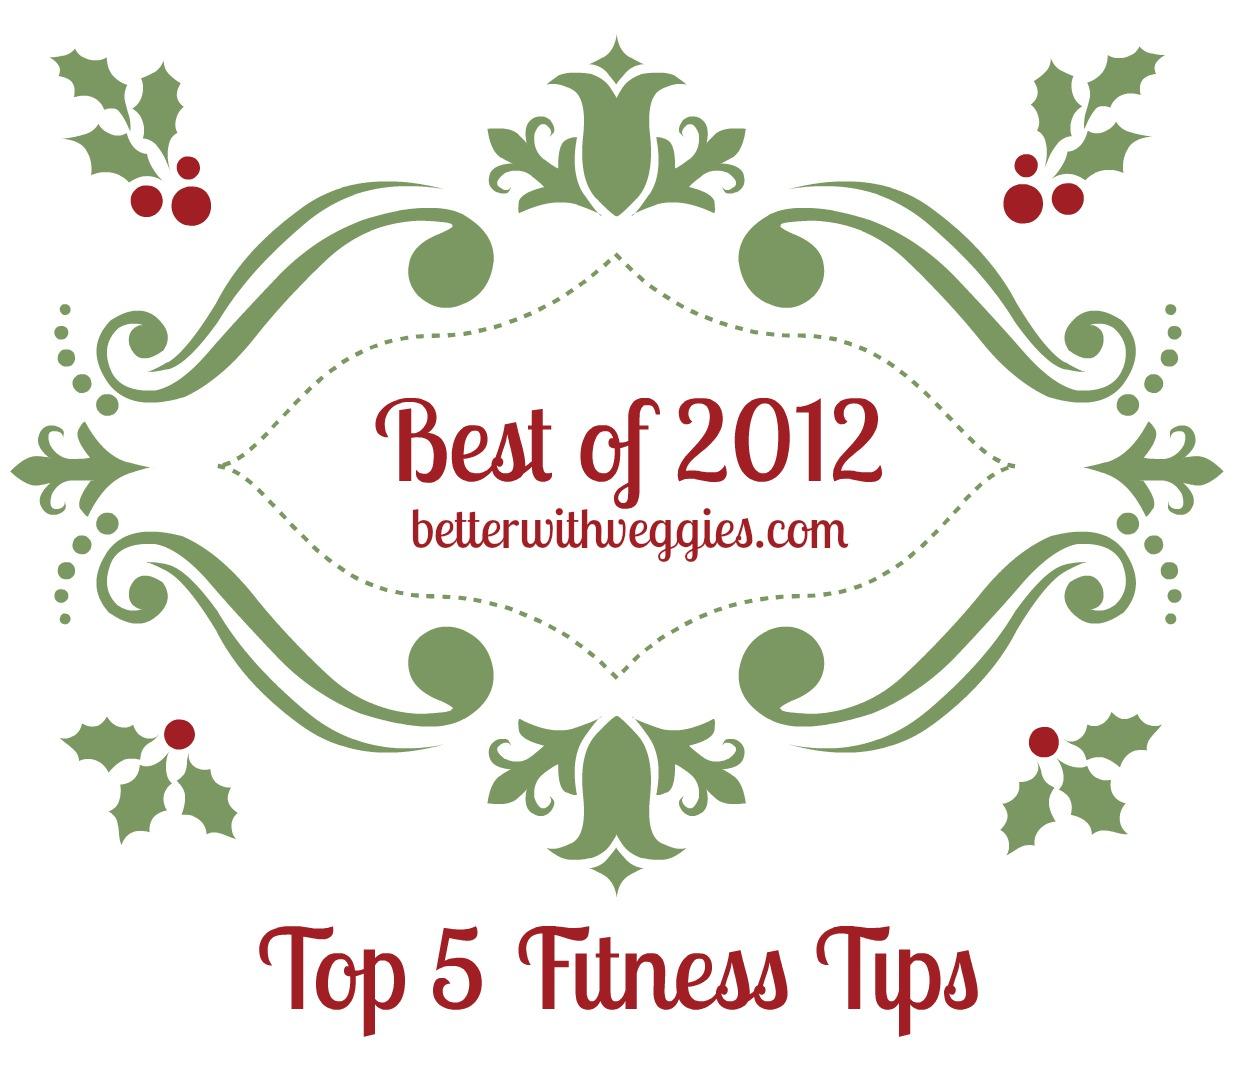 Bestof2012-Tips